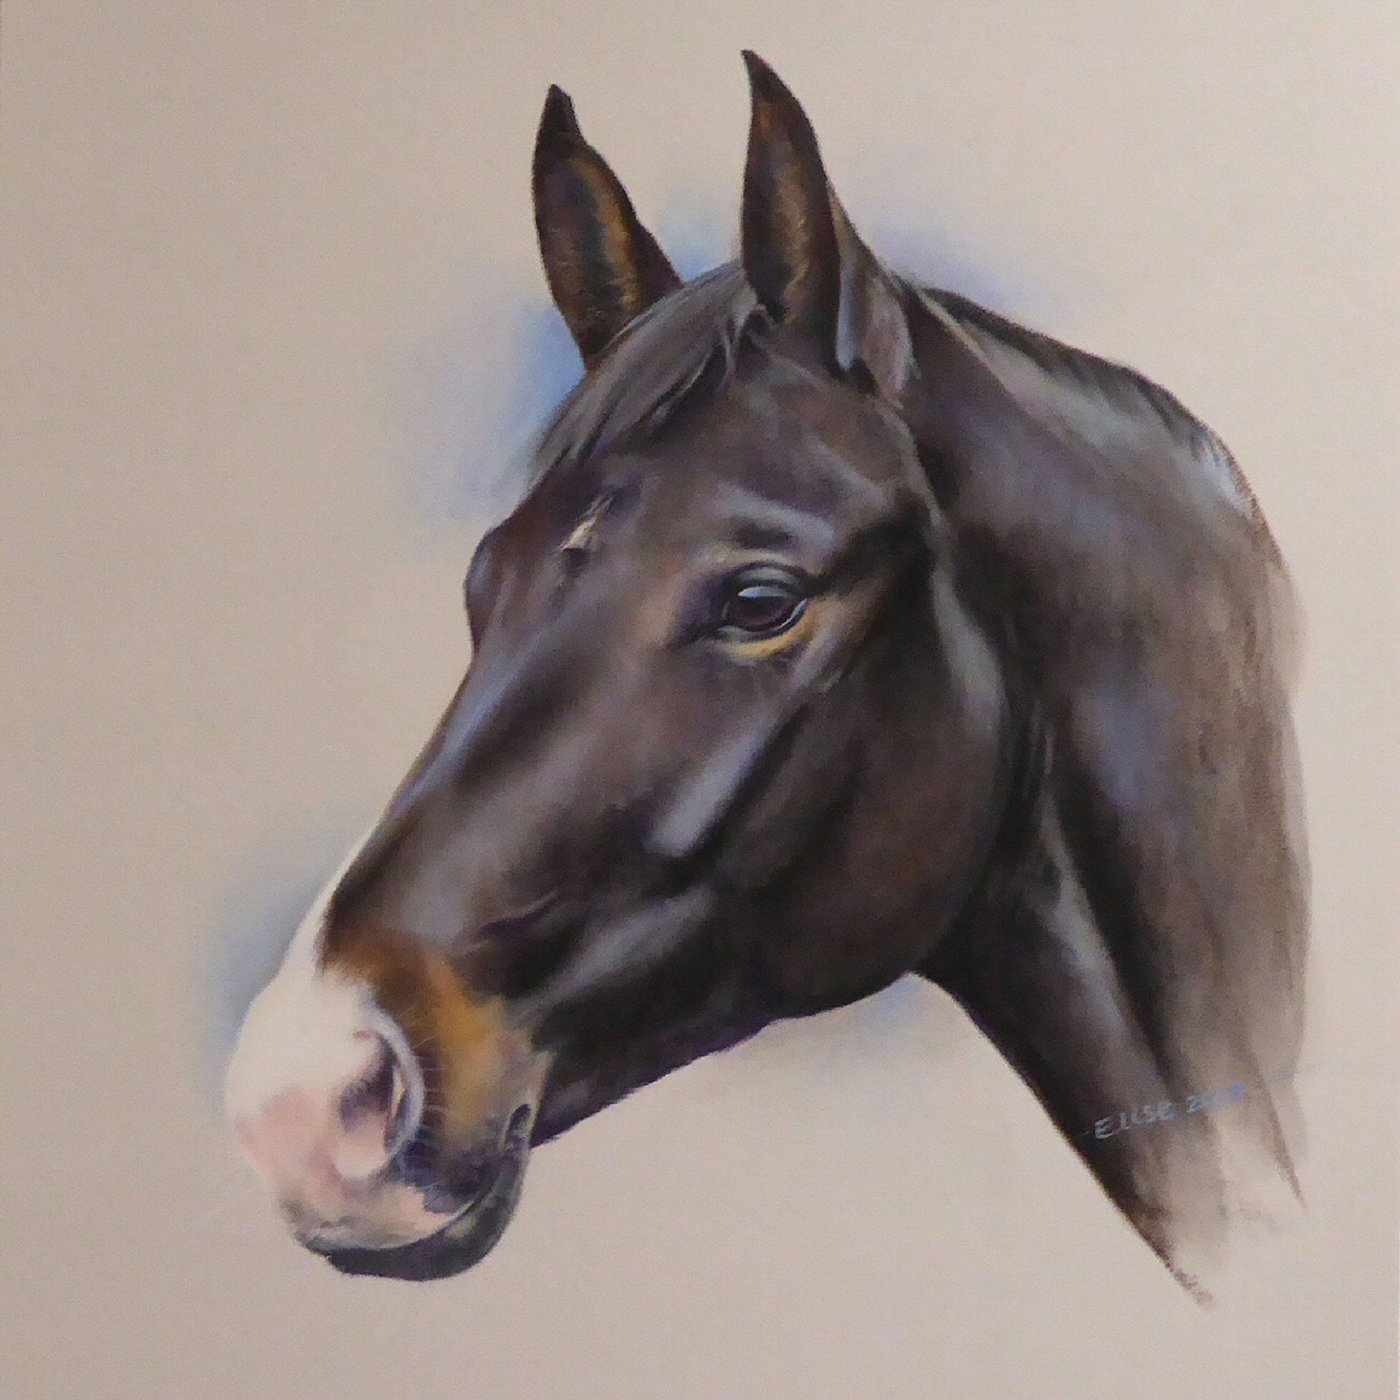 Geronimo - portrait